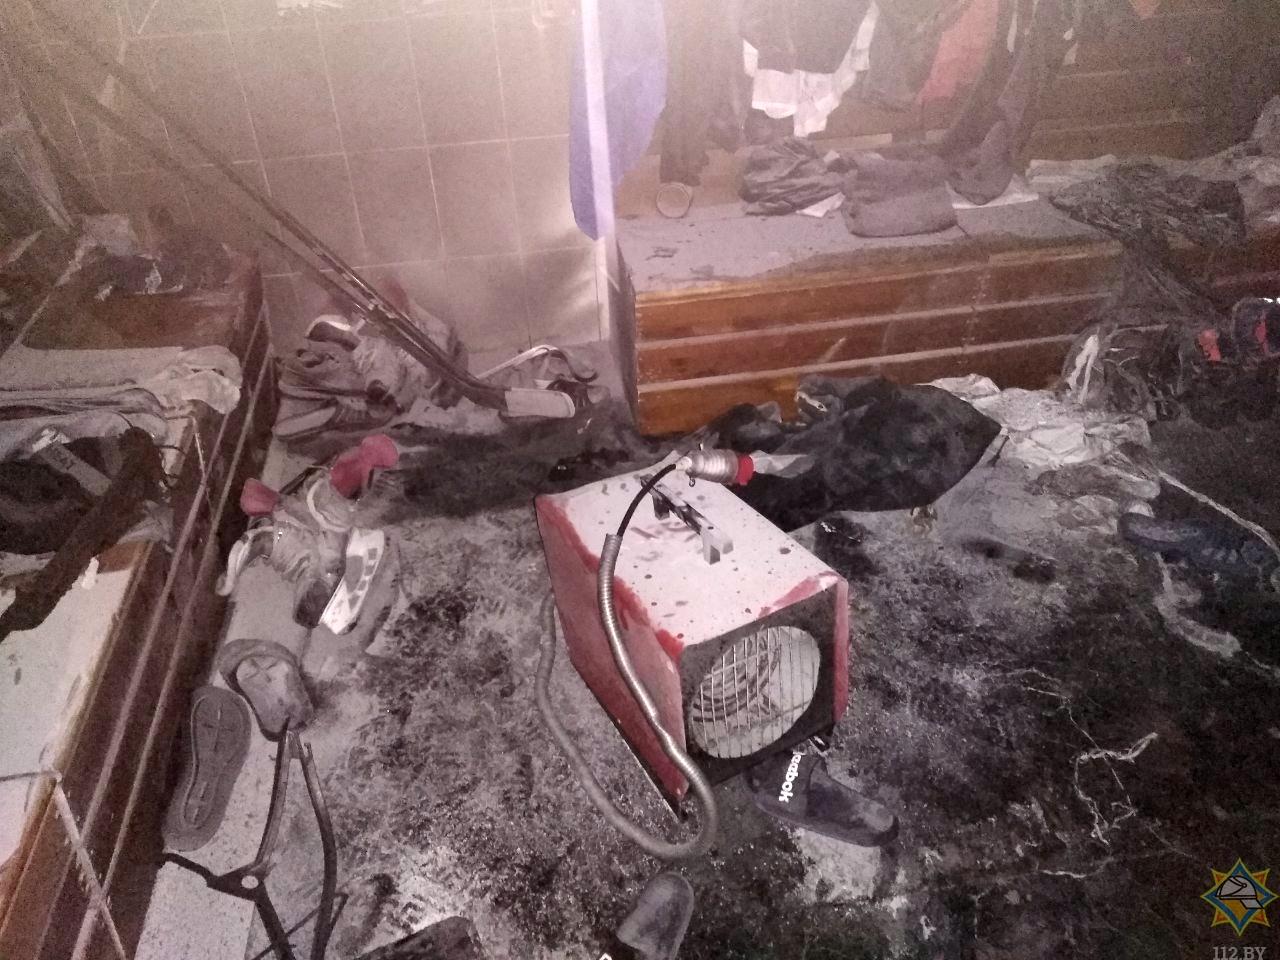 Пожар в Ледовом дворце. Фото: МЧС